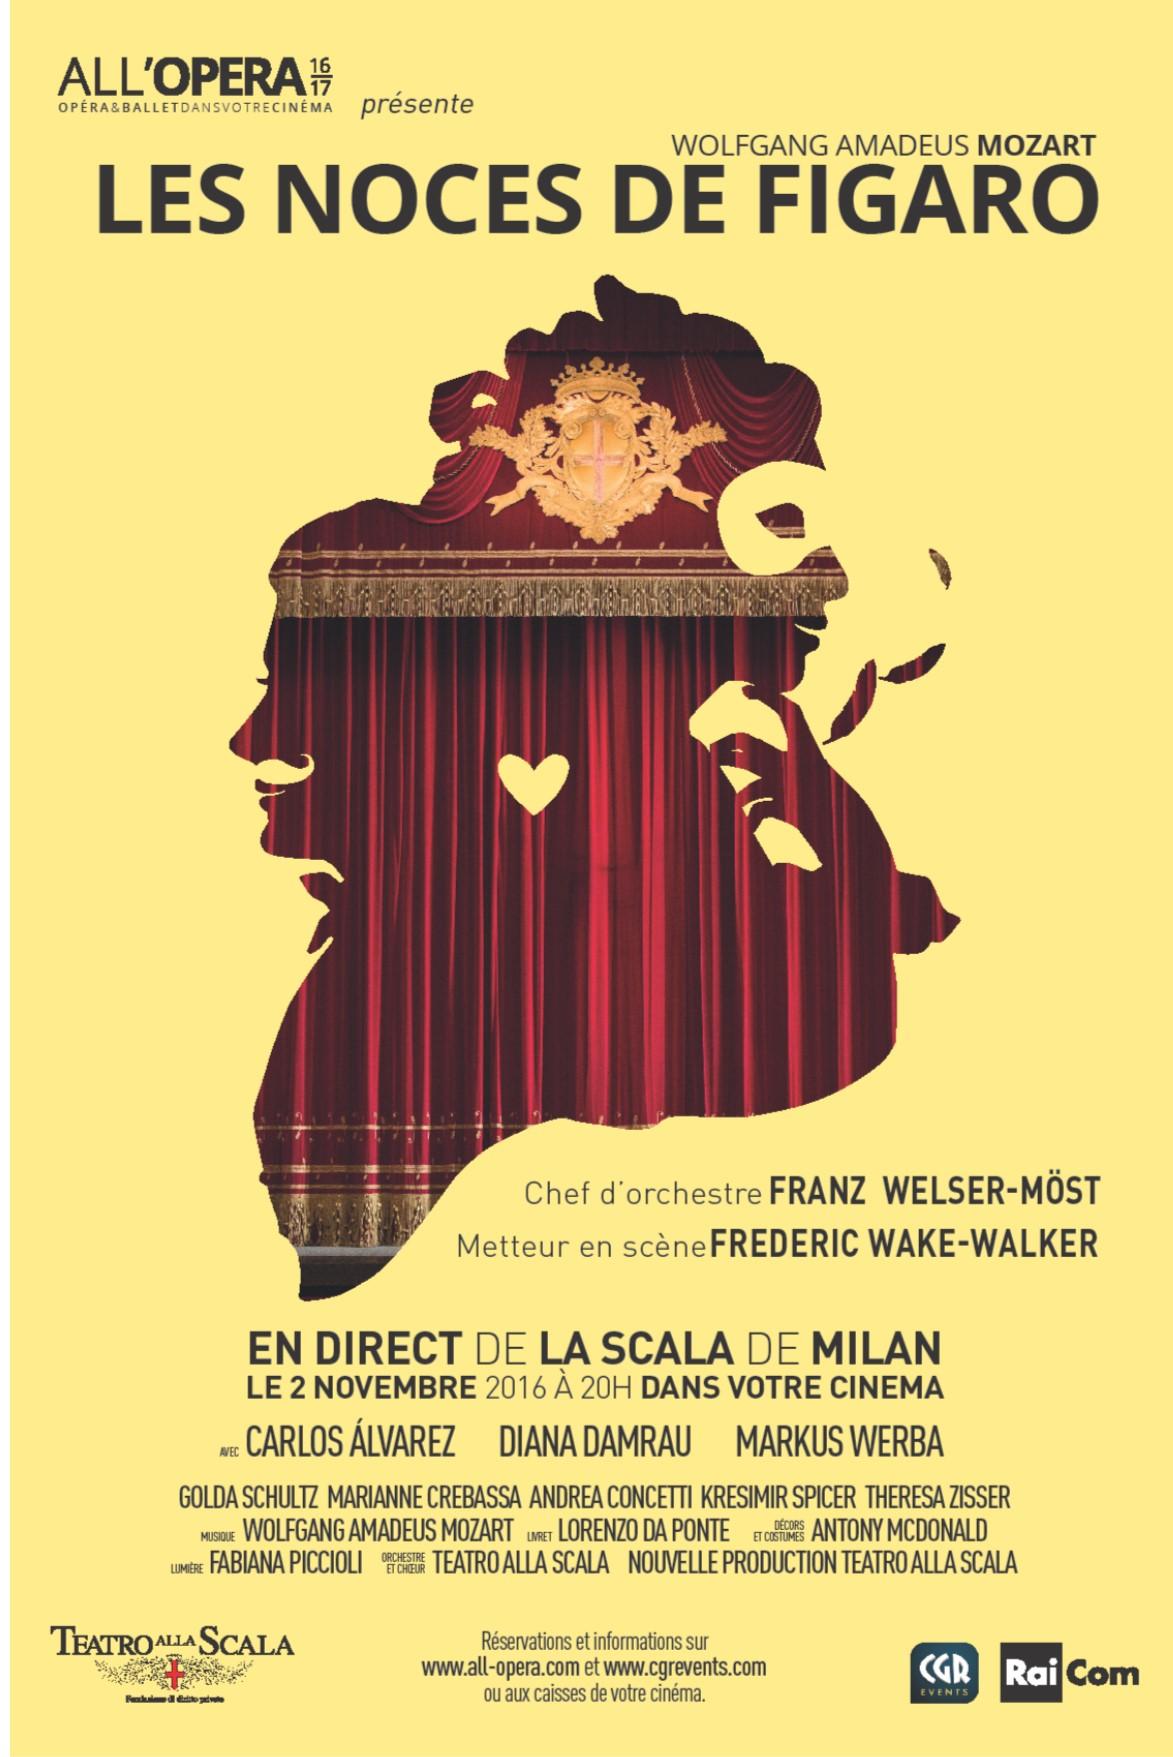 Télécharger Les Noces de Figaro - All'Opera (CGR Events) Gratuit Uploaded